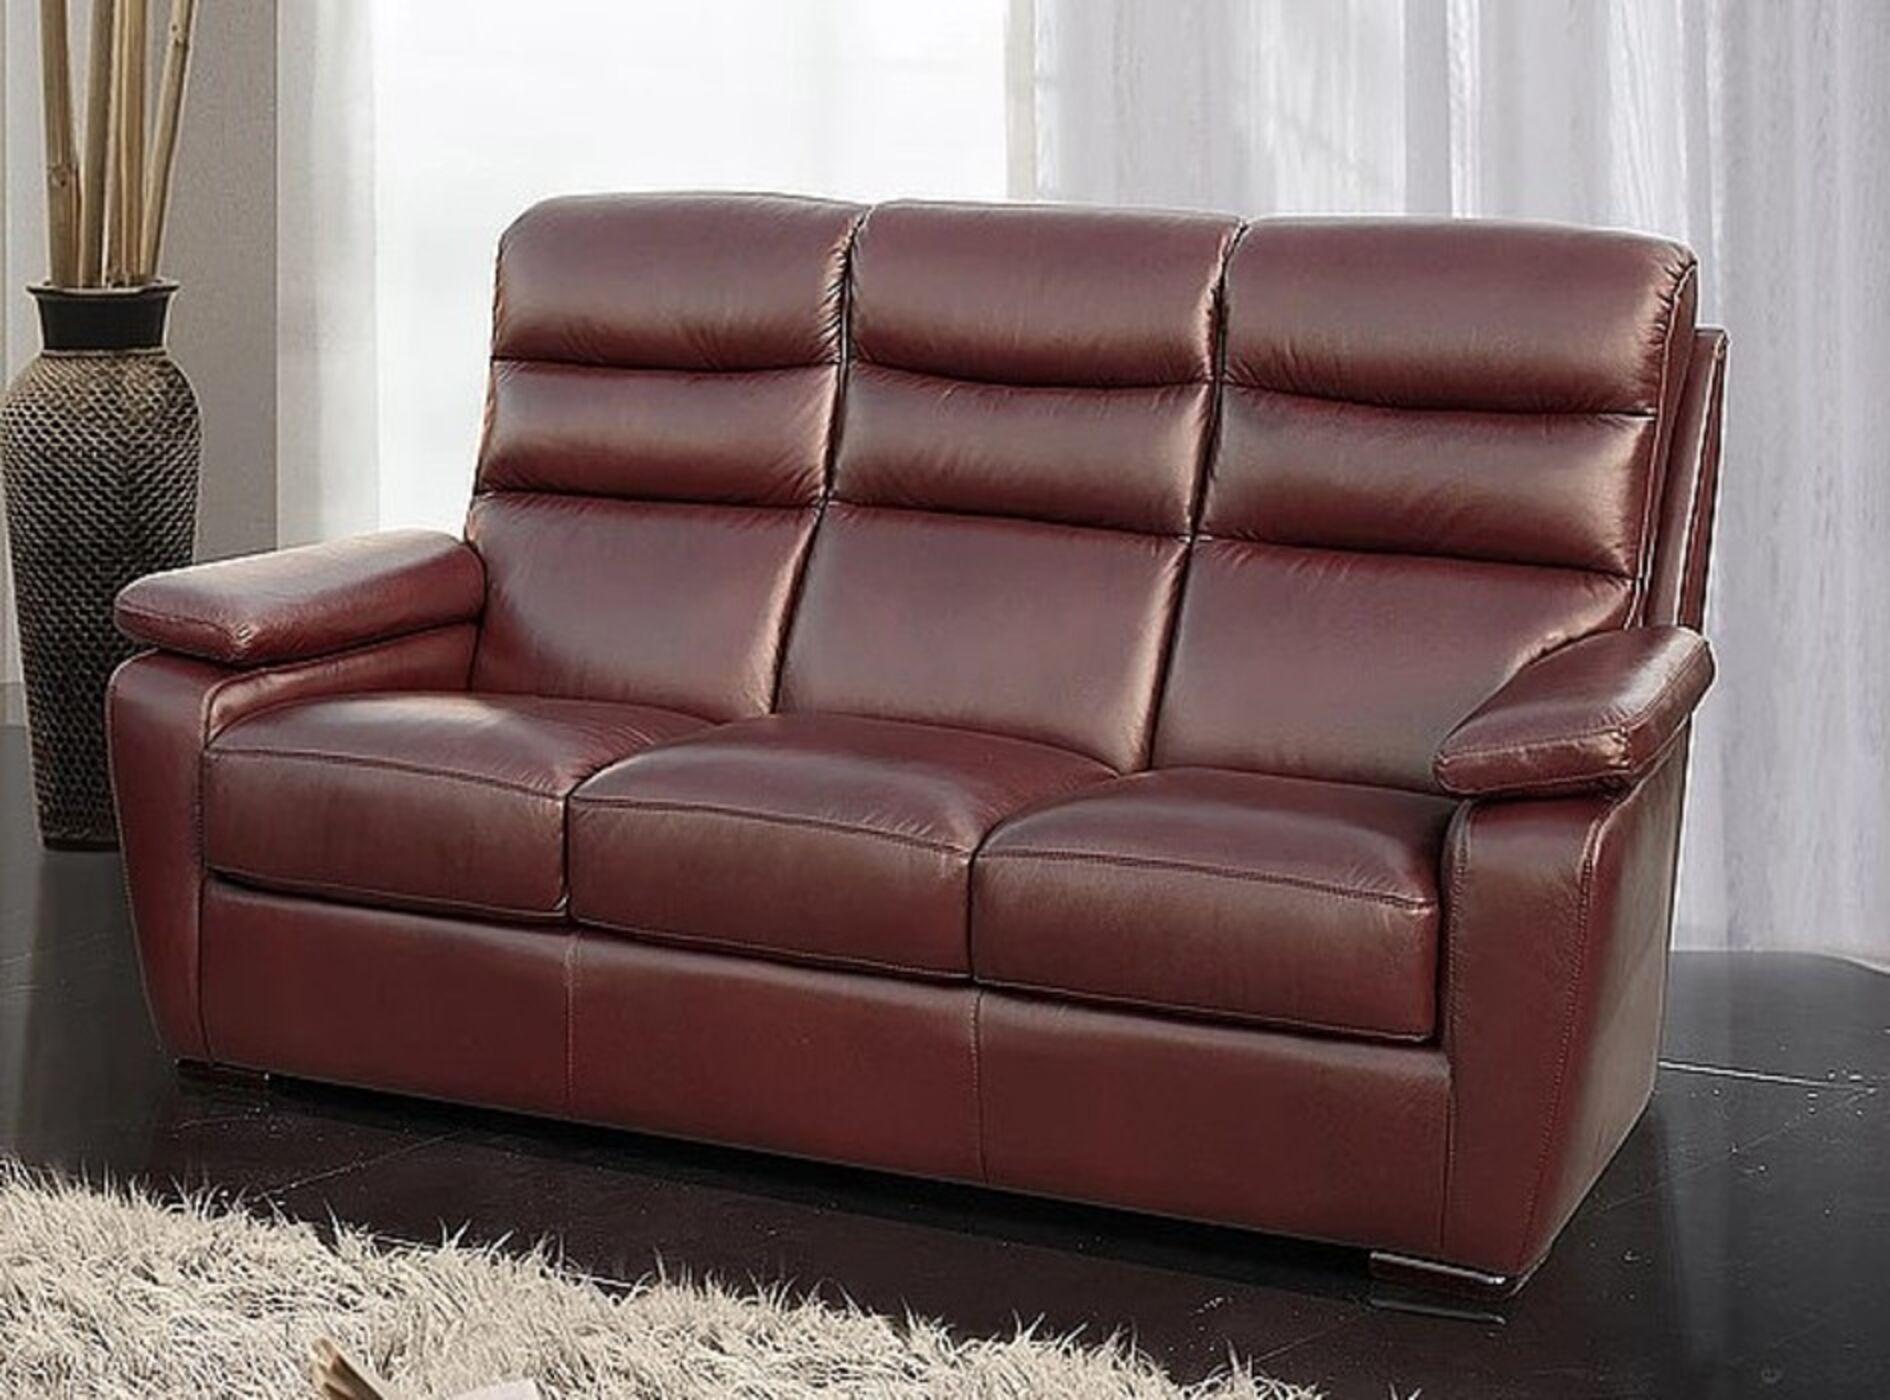 amalfi 3 seater italian leather sofa offer wine rh winchesterleather com